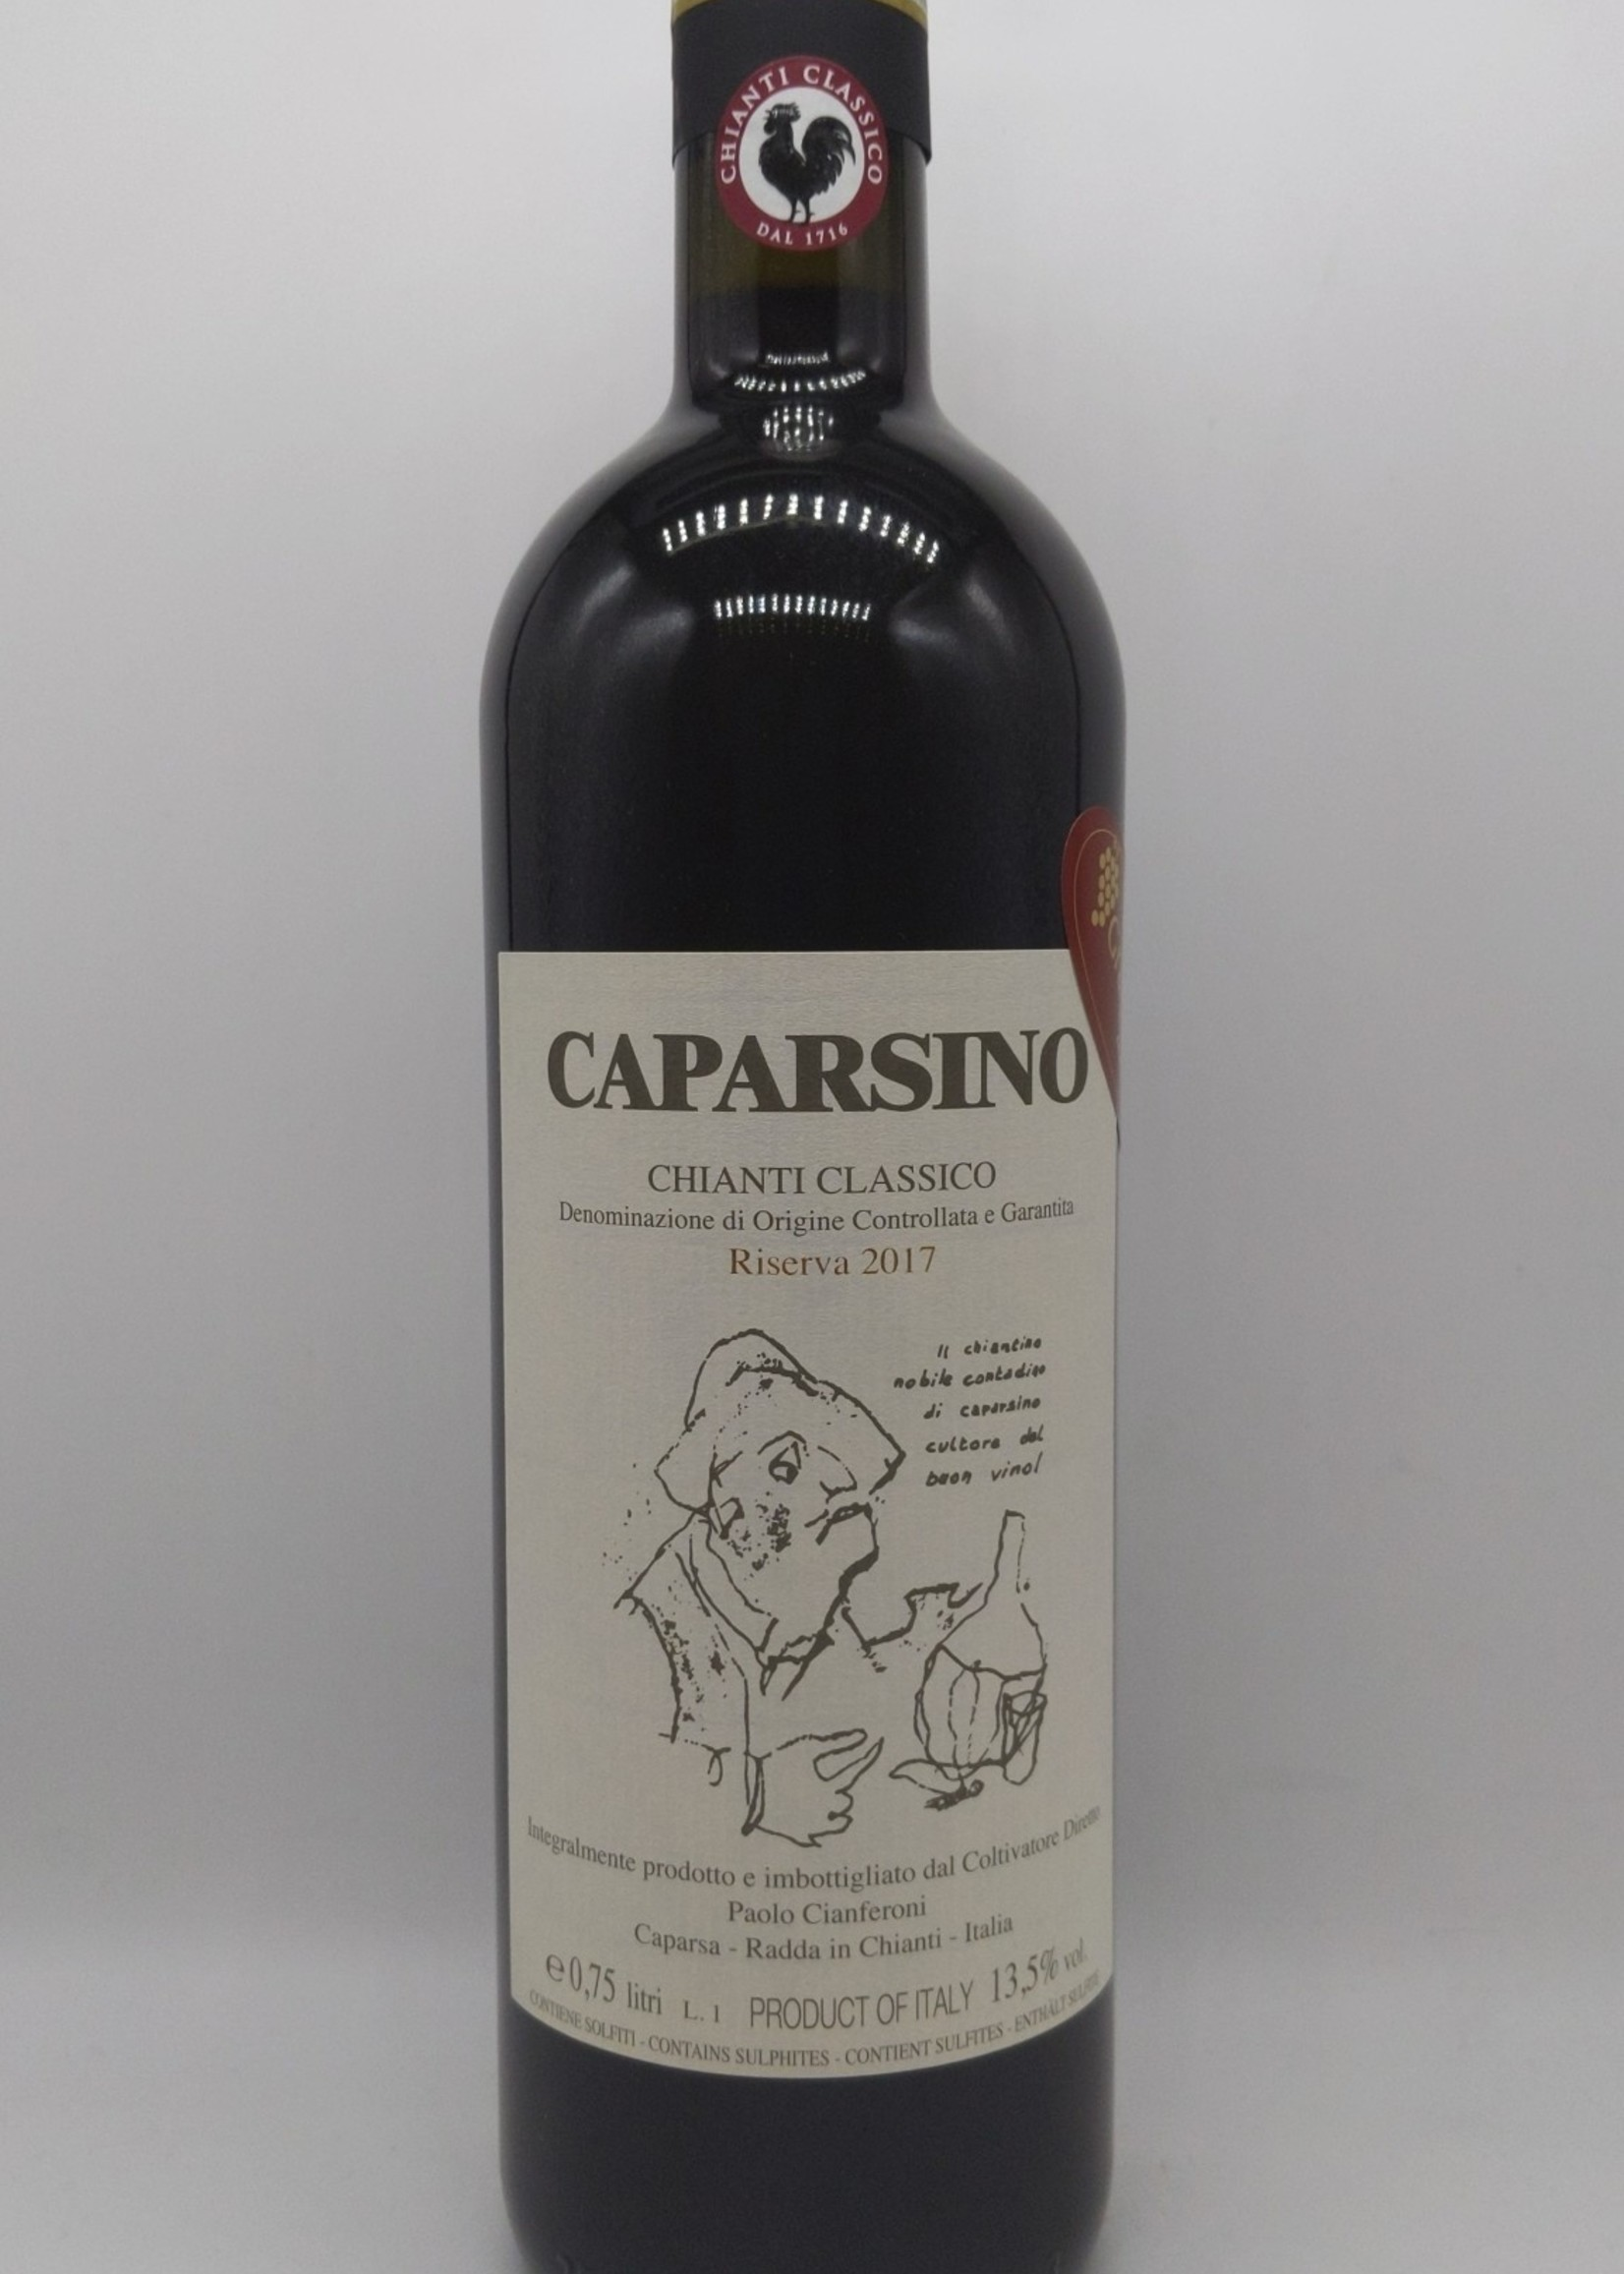 2017 CAPARSA CARPARSINO CHIANTI CLASSICO RISERVA 750